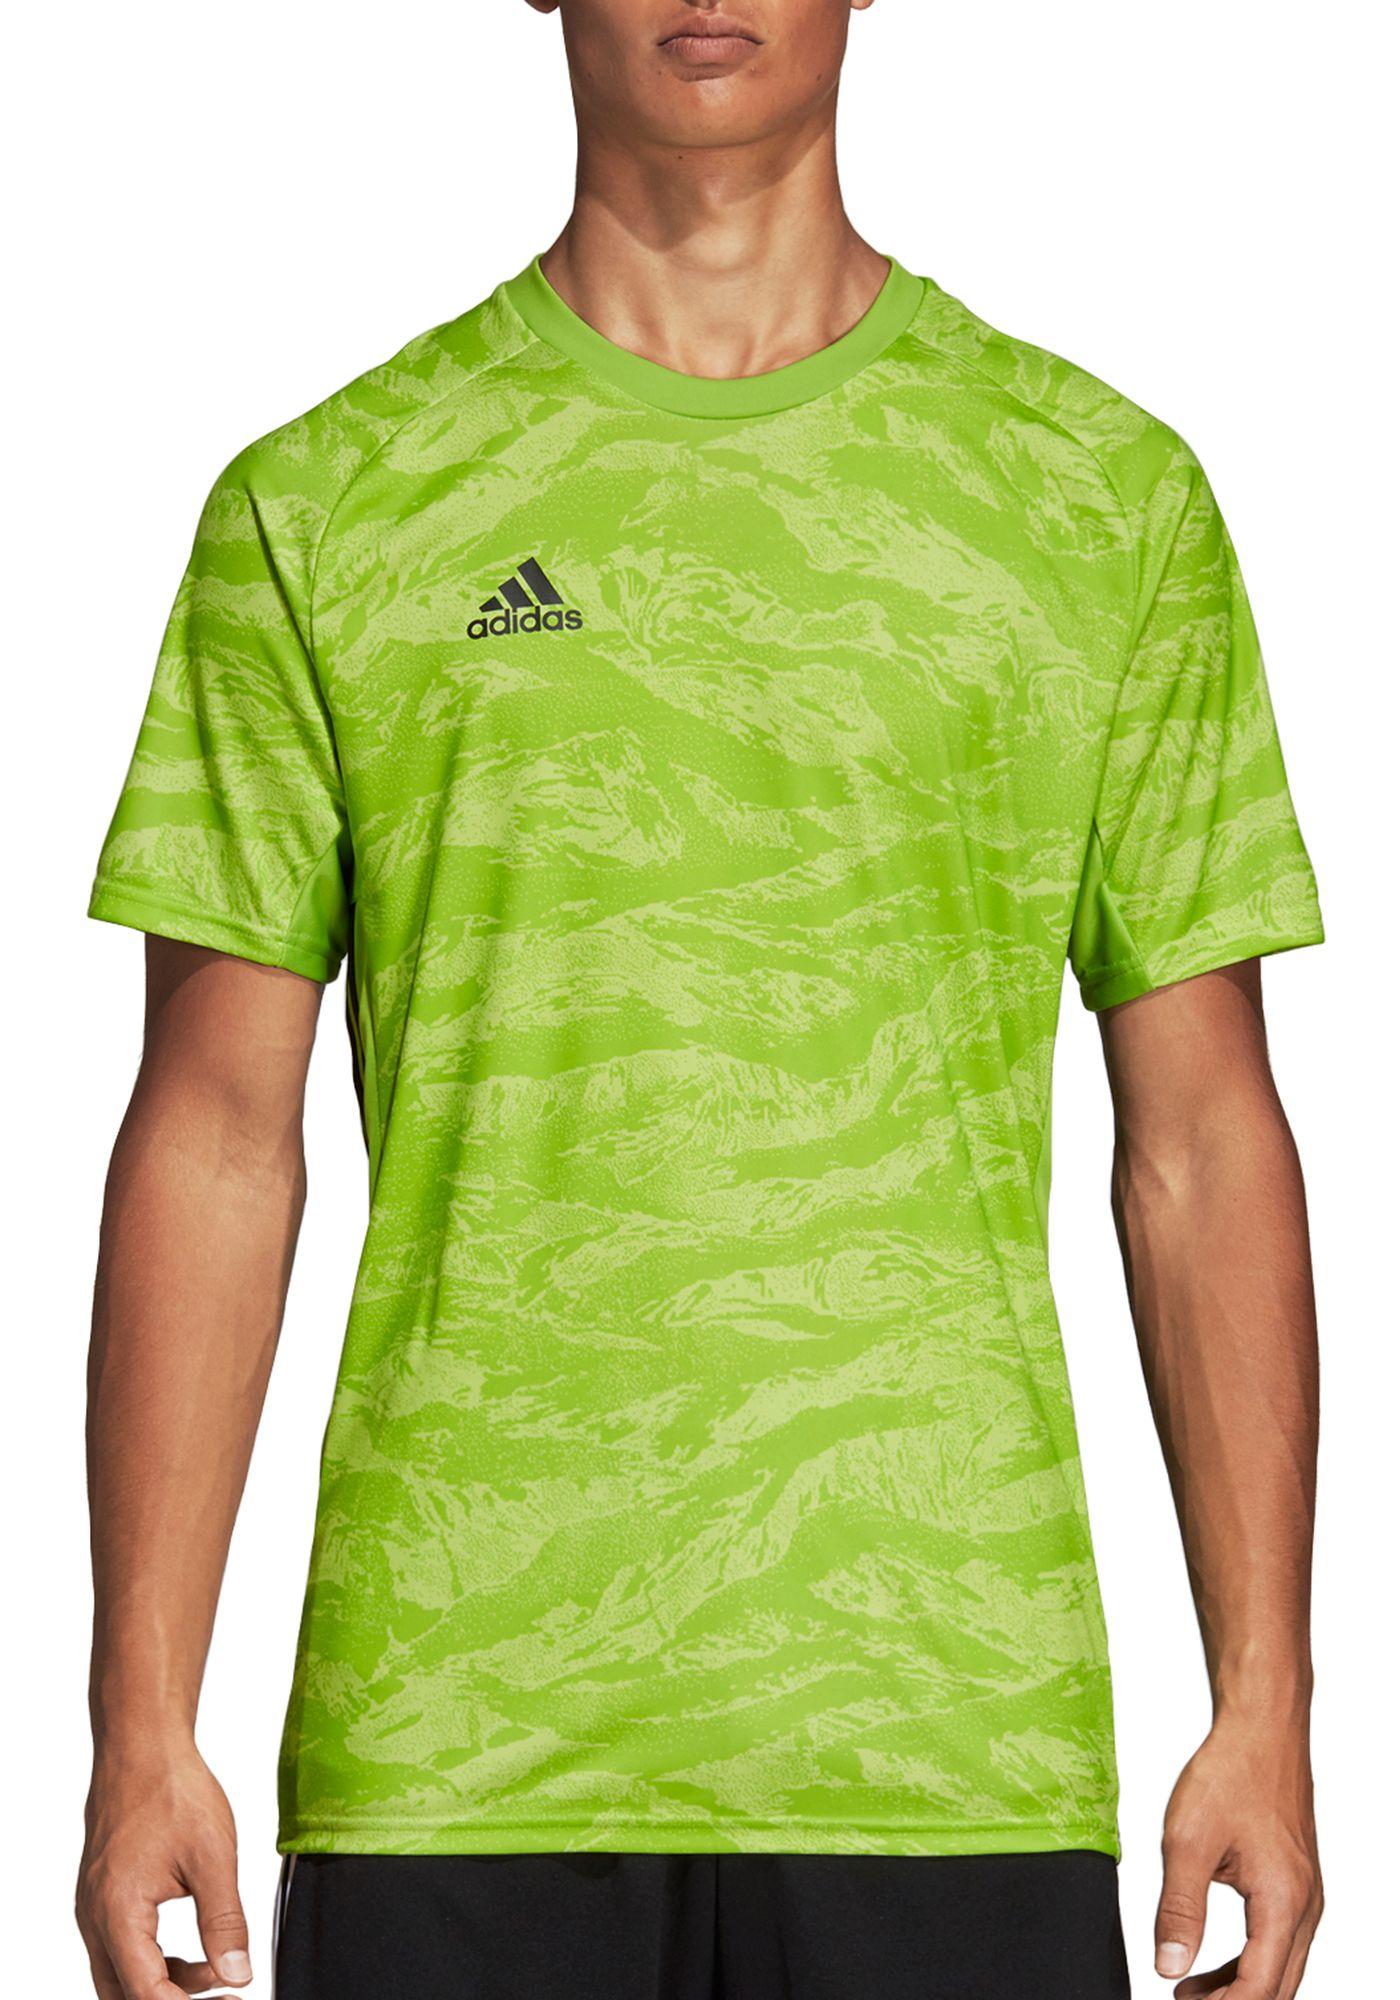 adidas Men's AdiPro 18 Short Sleeve Goalkeeper Jersey